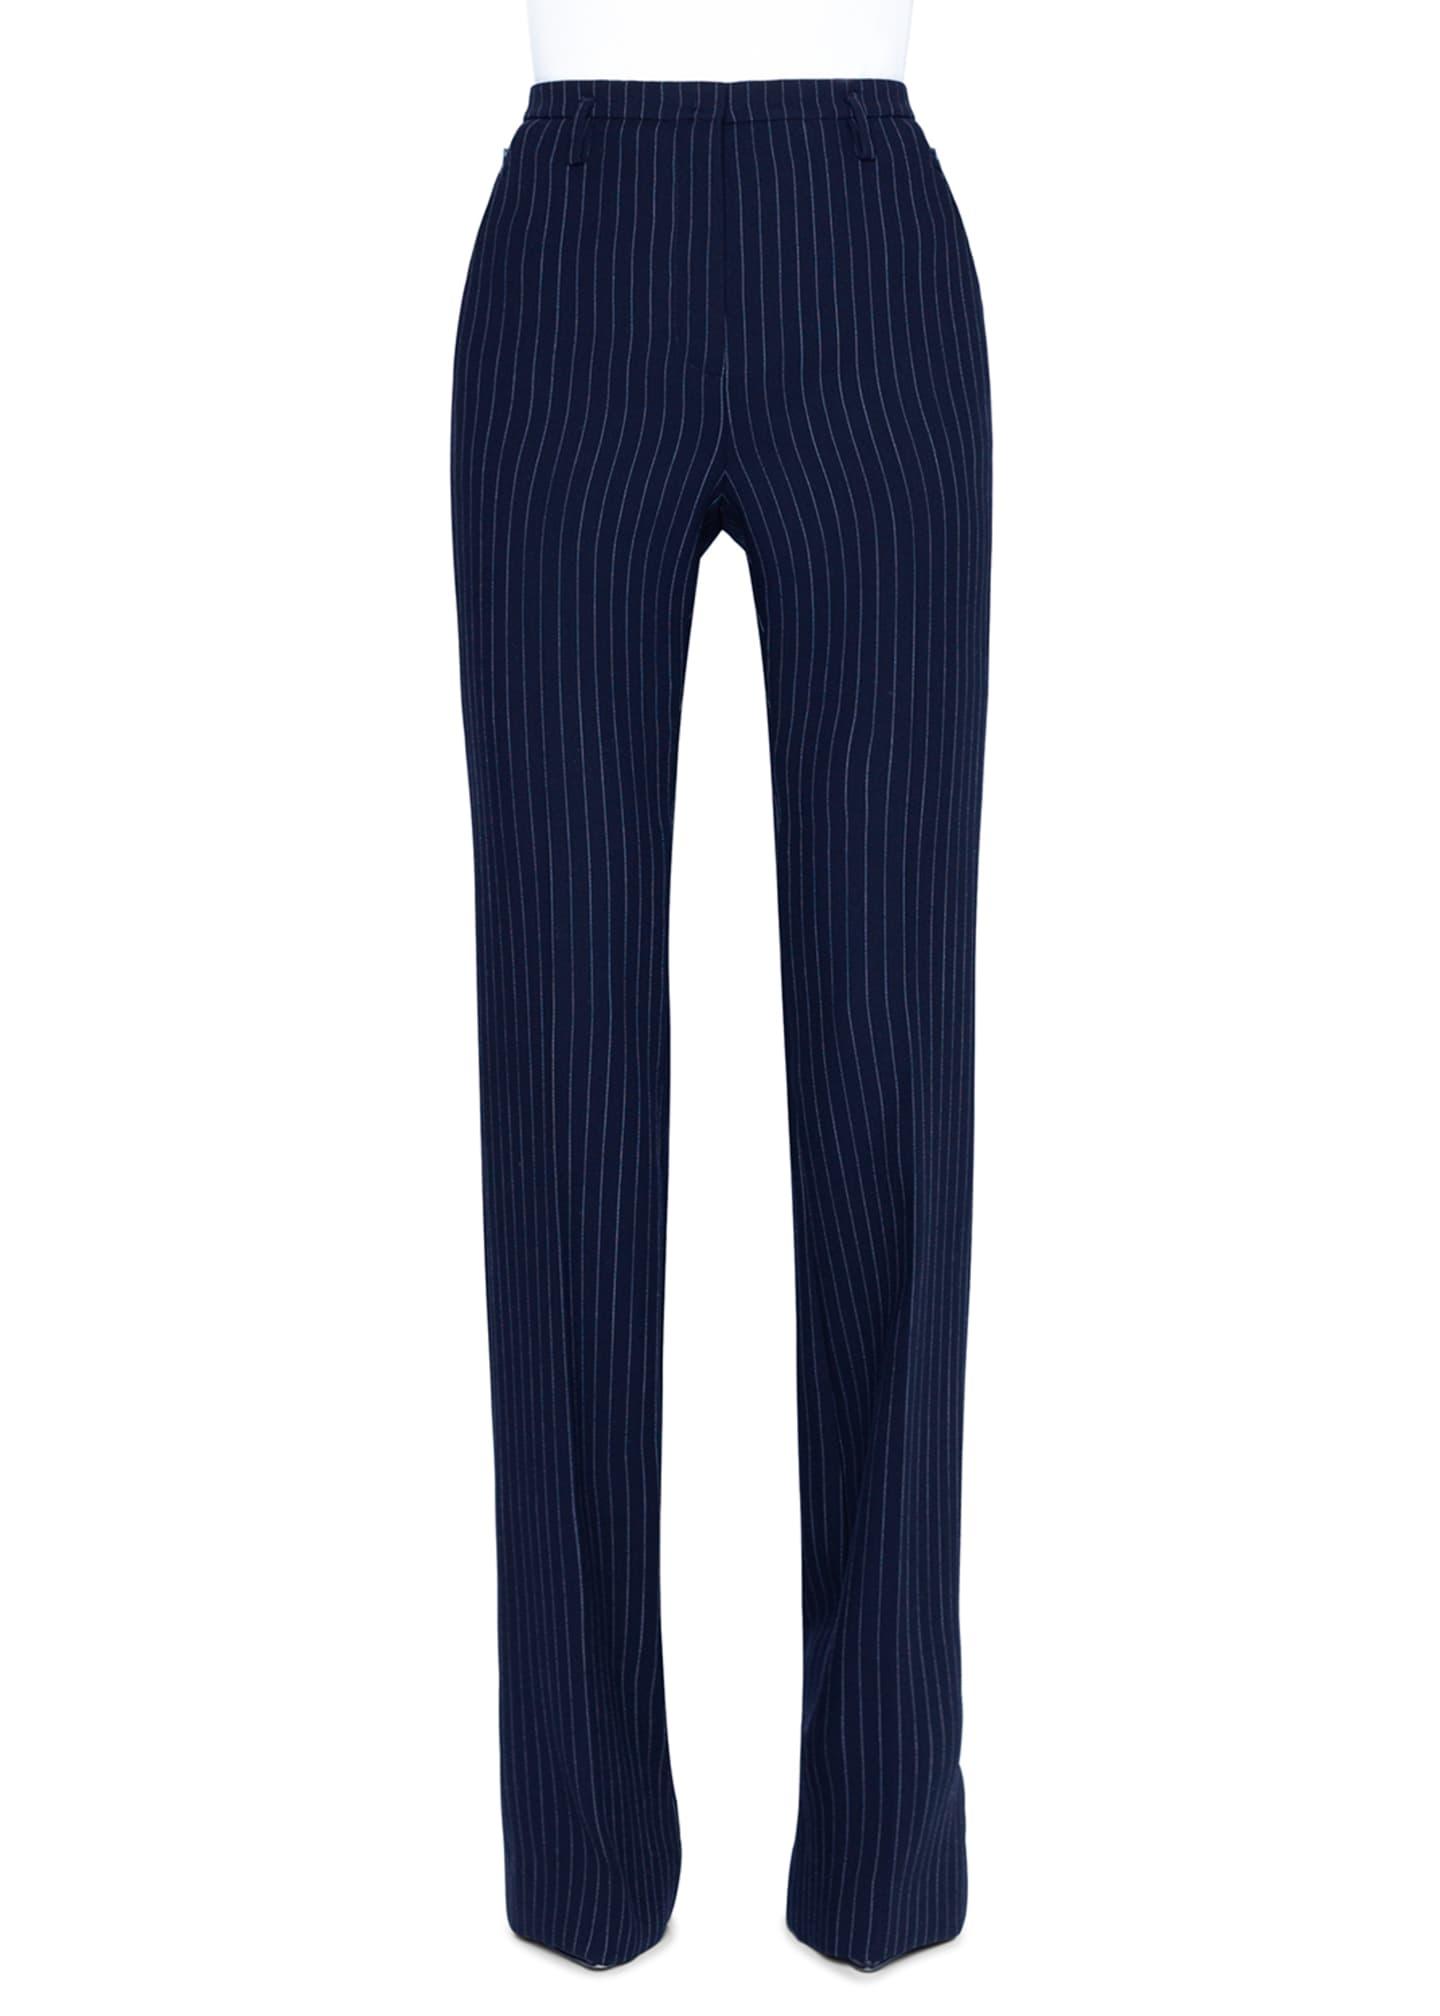 Akris Farah Pinstriped Wool Straight-Leg Pants